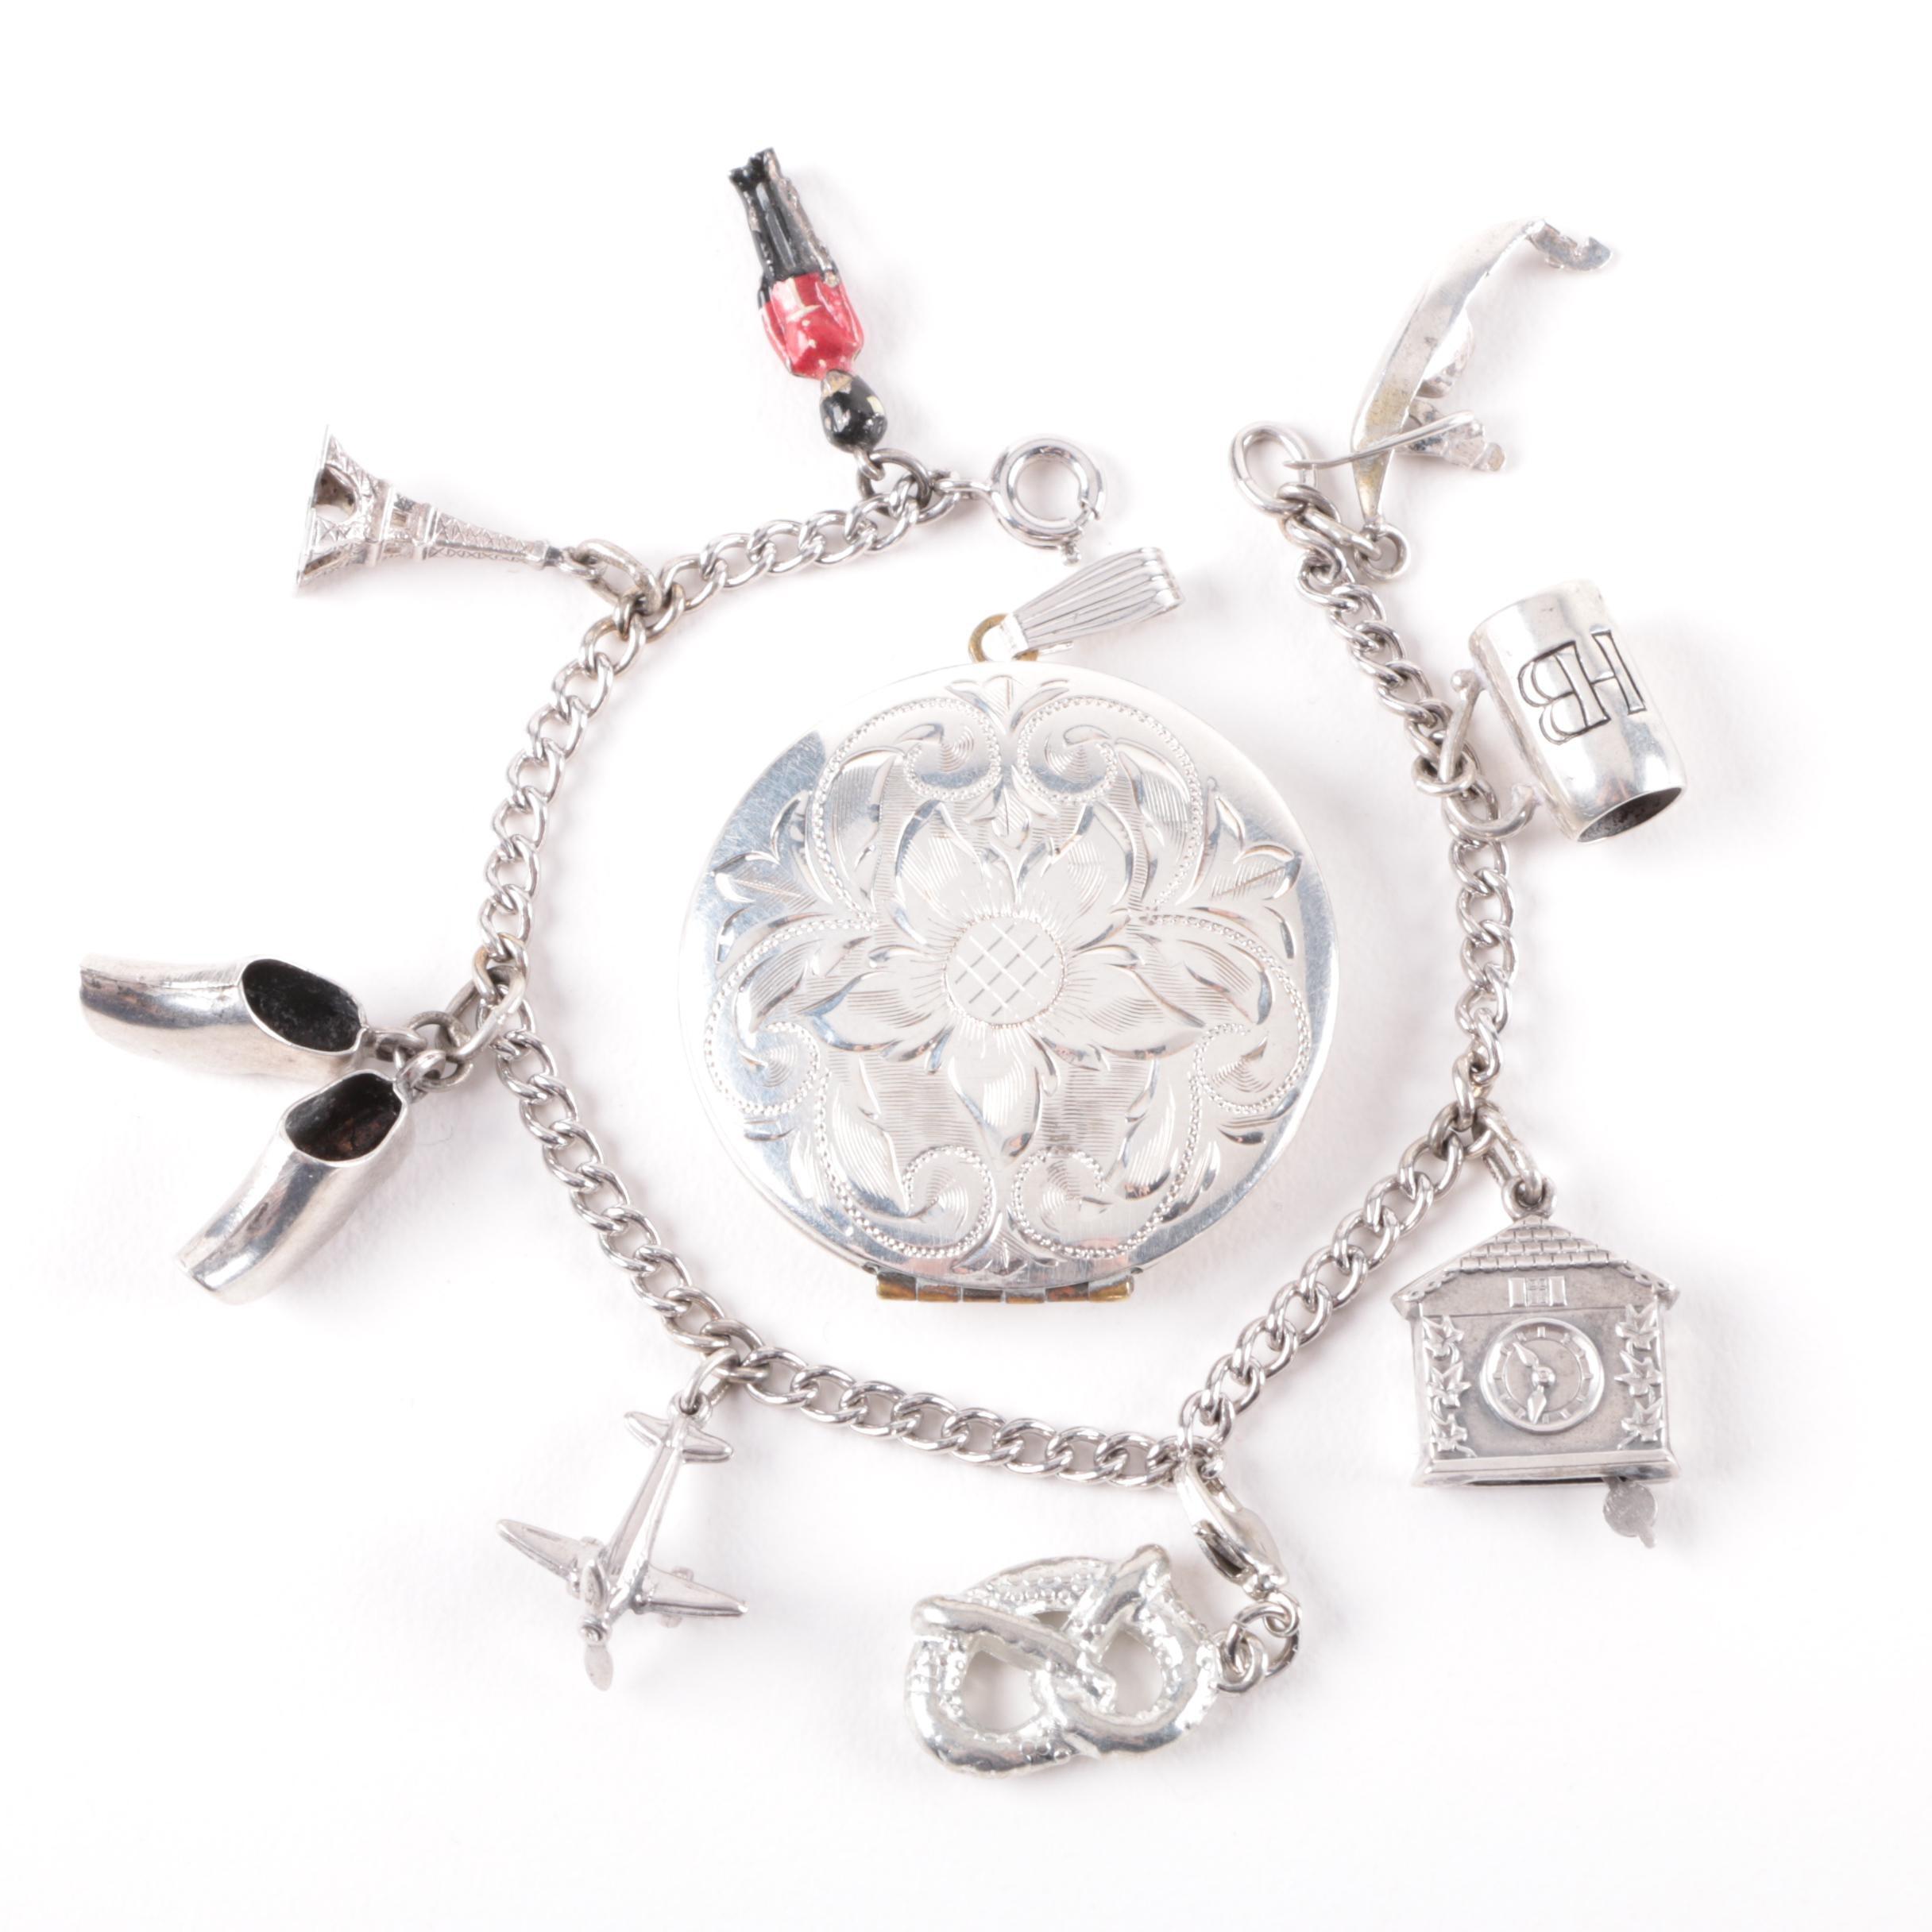 Sterling Silver Charm Bracelet and Monogrammed Locket